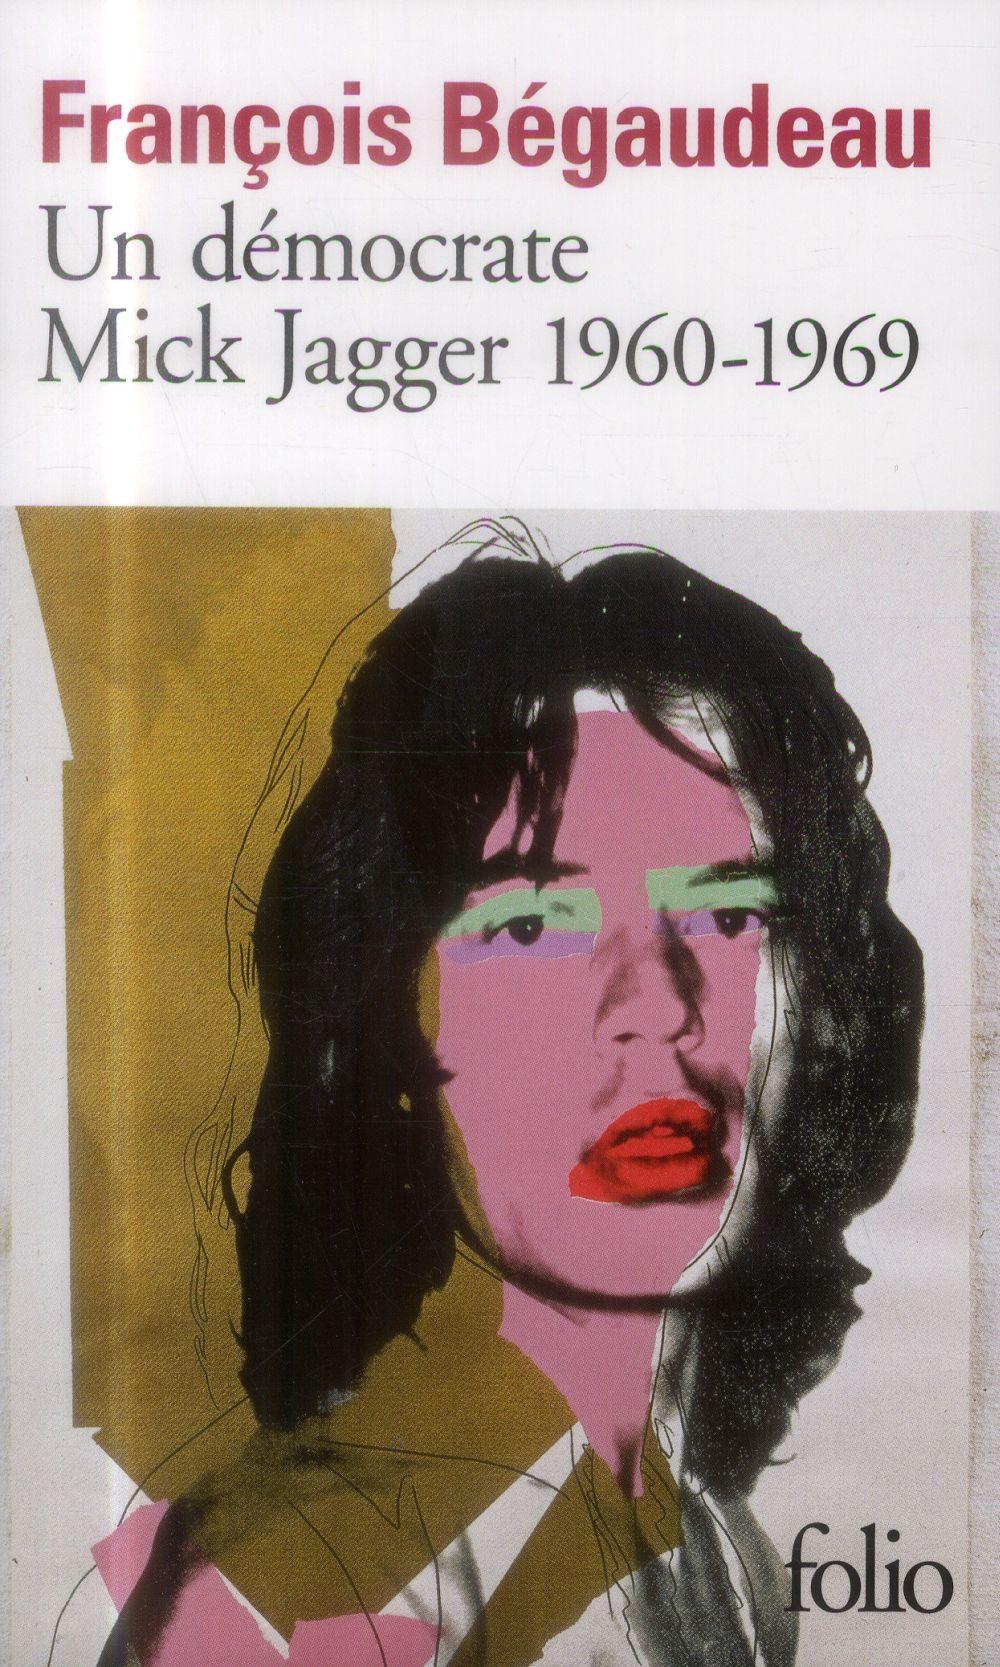 UN DEMOCRATE : MICK JAGGER 1960-1969